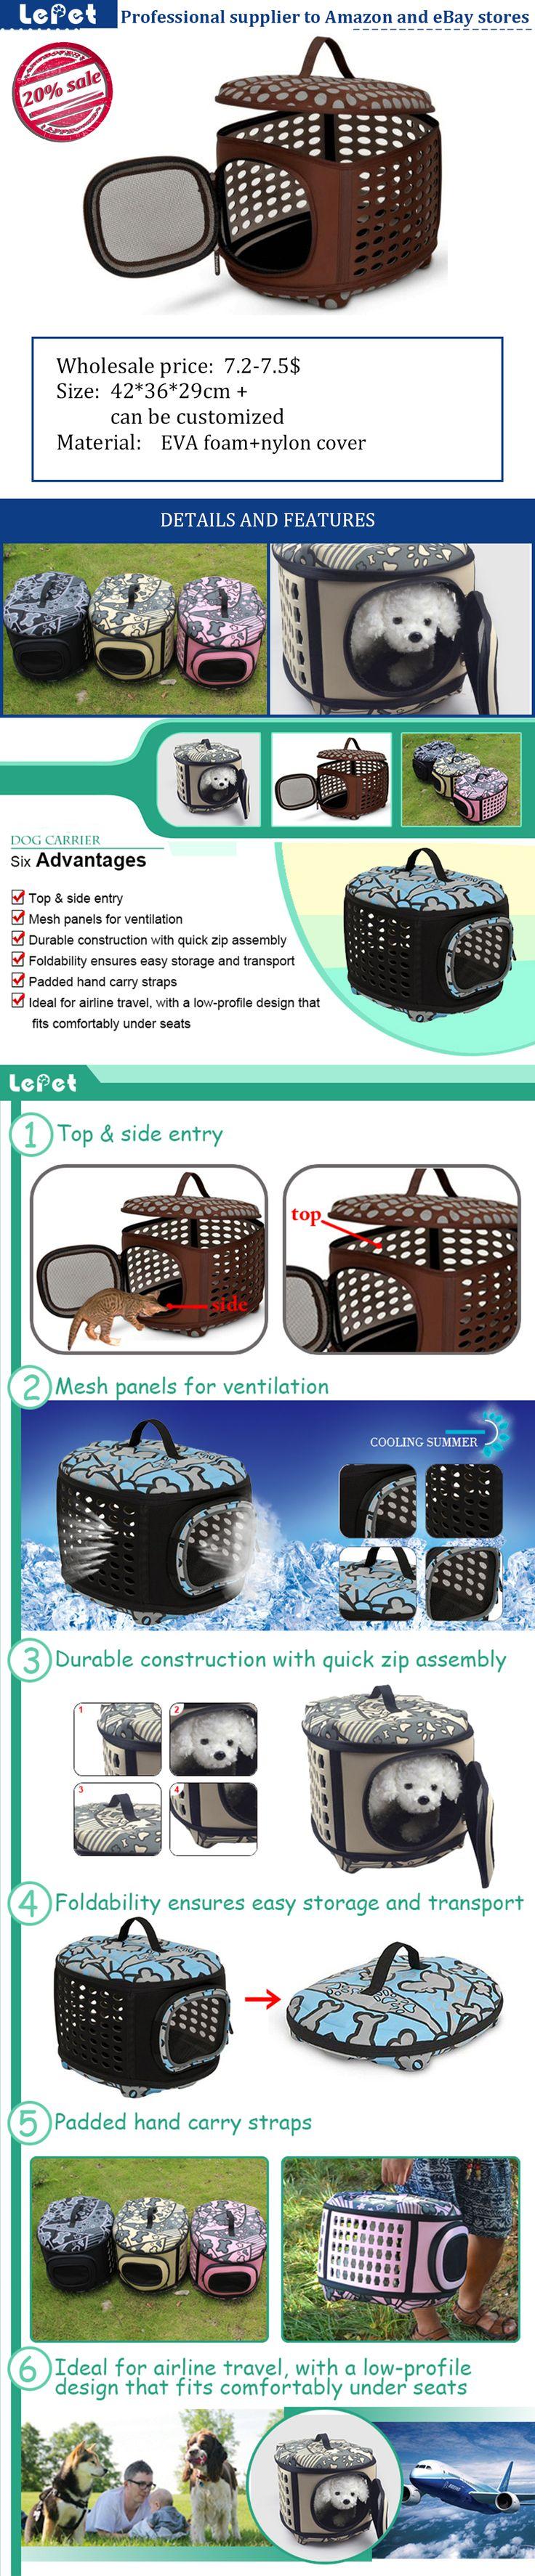 Soft Portable Dog Carrier/Pet Travel Bag/pet carrier dog carrier  manufacturers/suppliers/wholesale/buy/factory